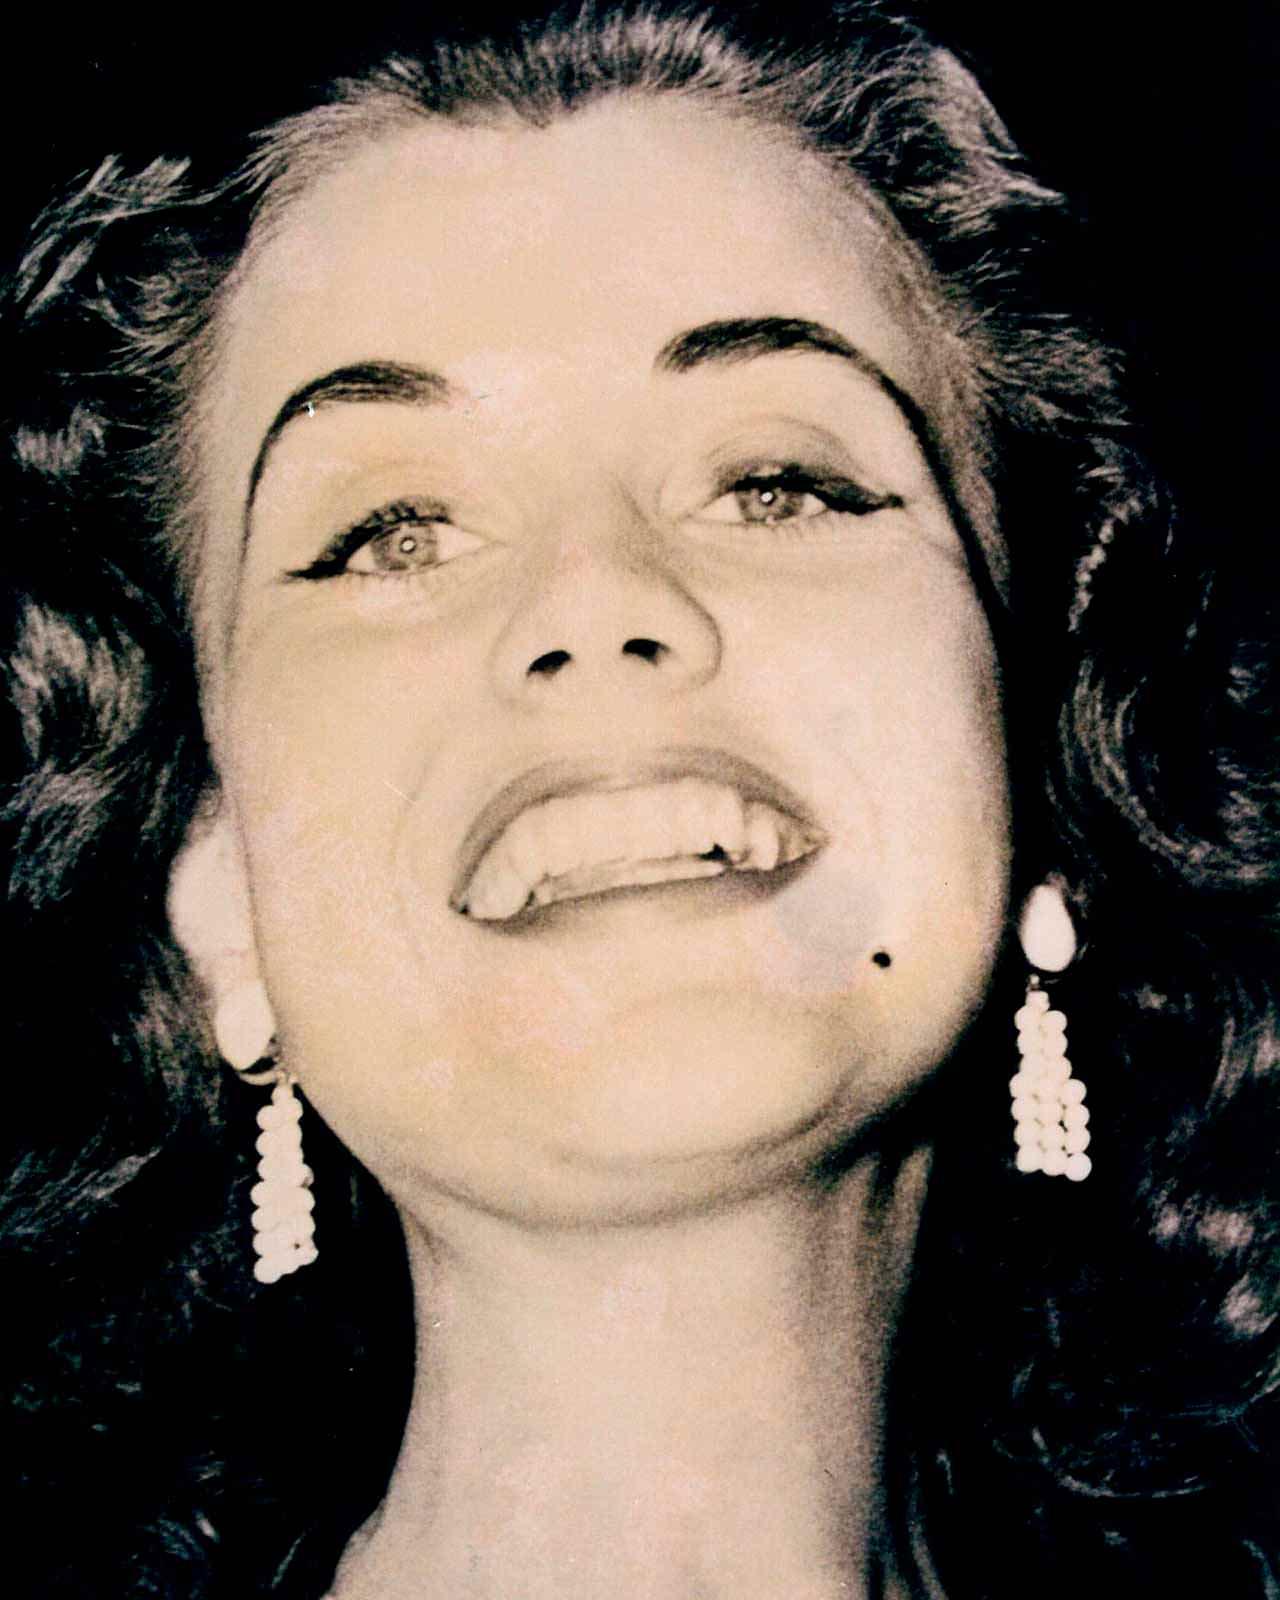 Фото | Мисс Мира 1951 года Кикки Хоканссон